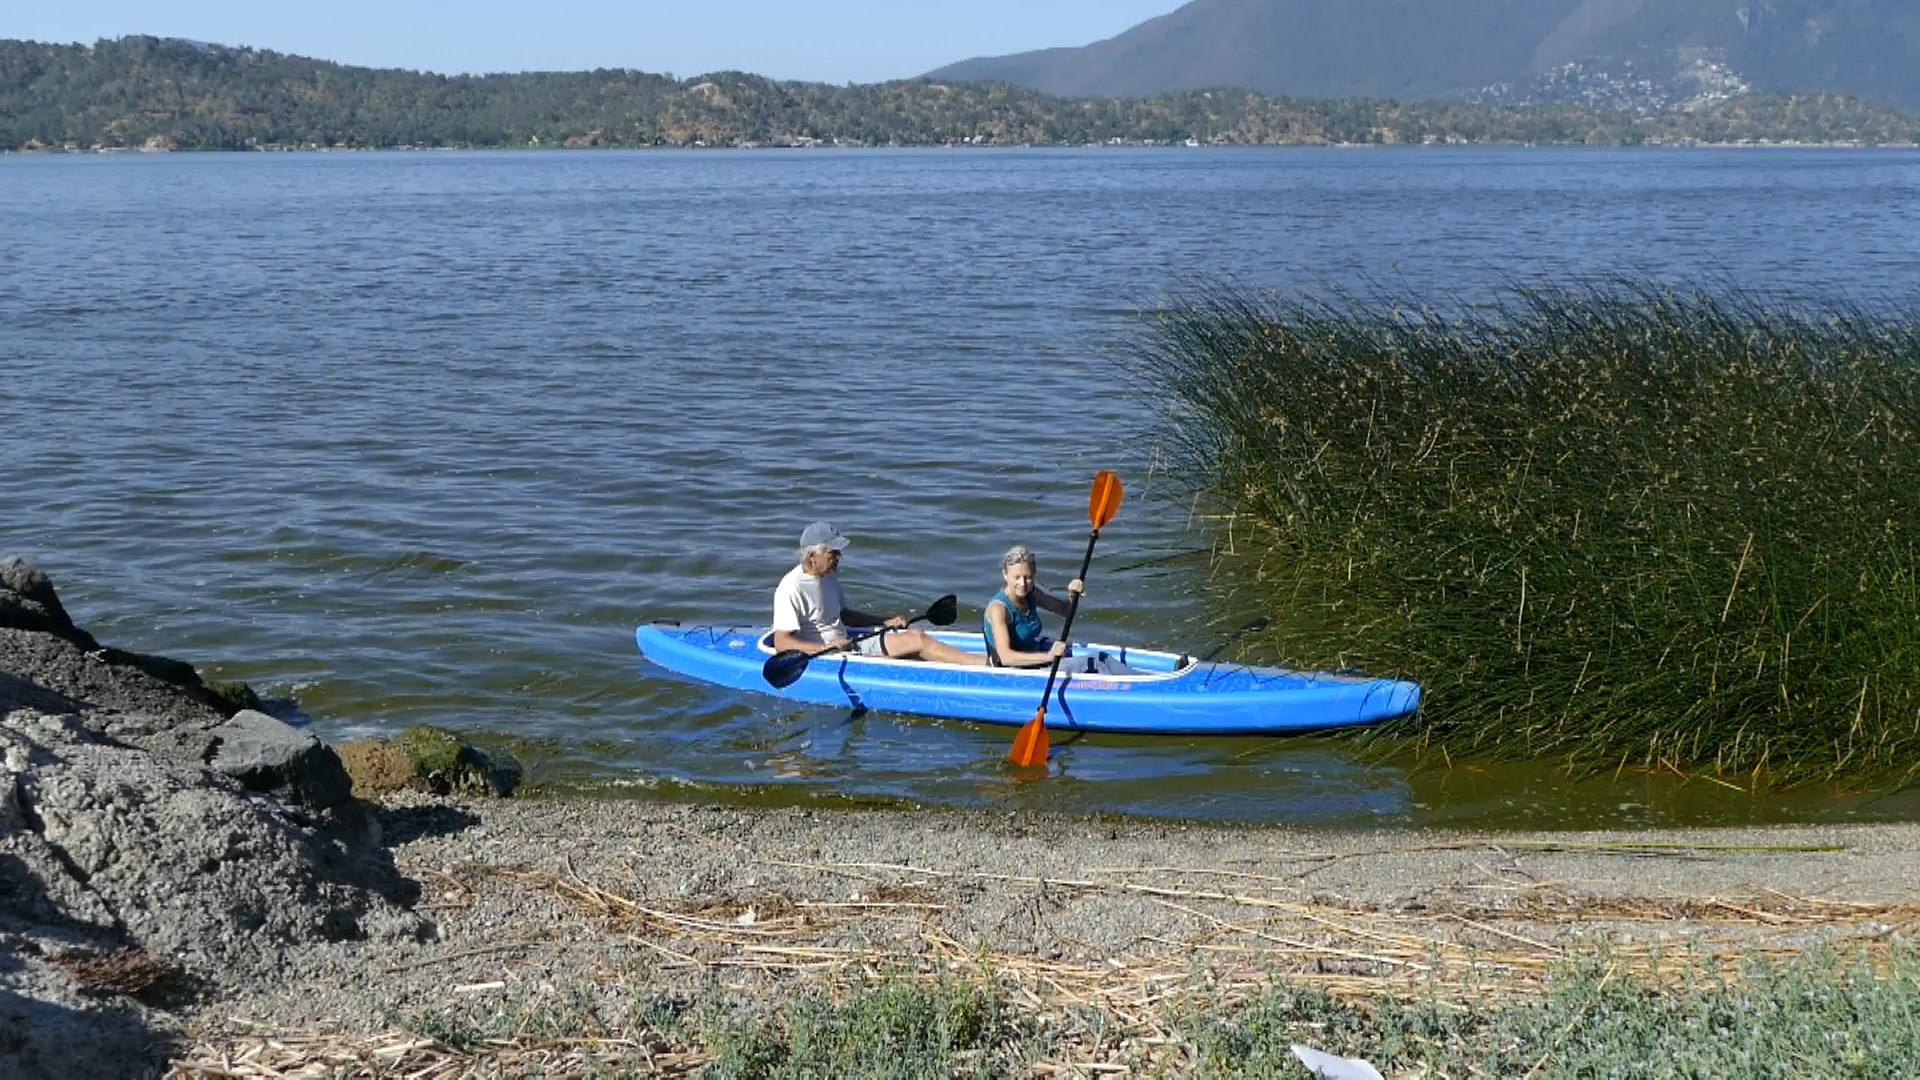 AirVolution paddled tandem